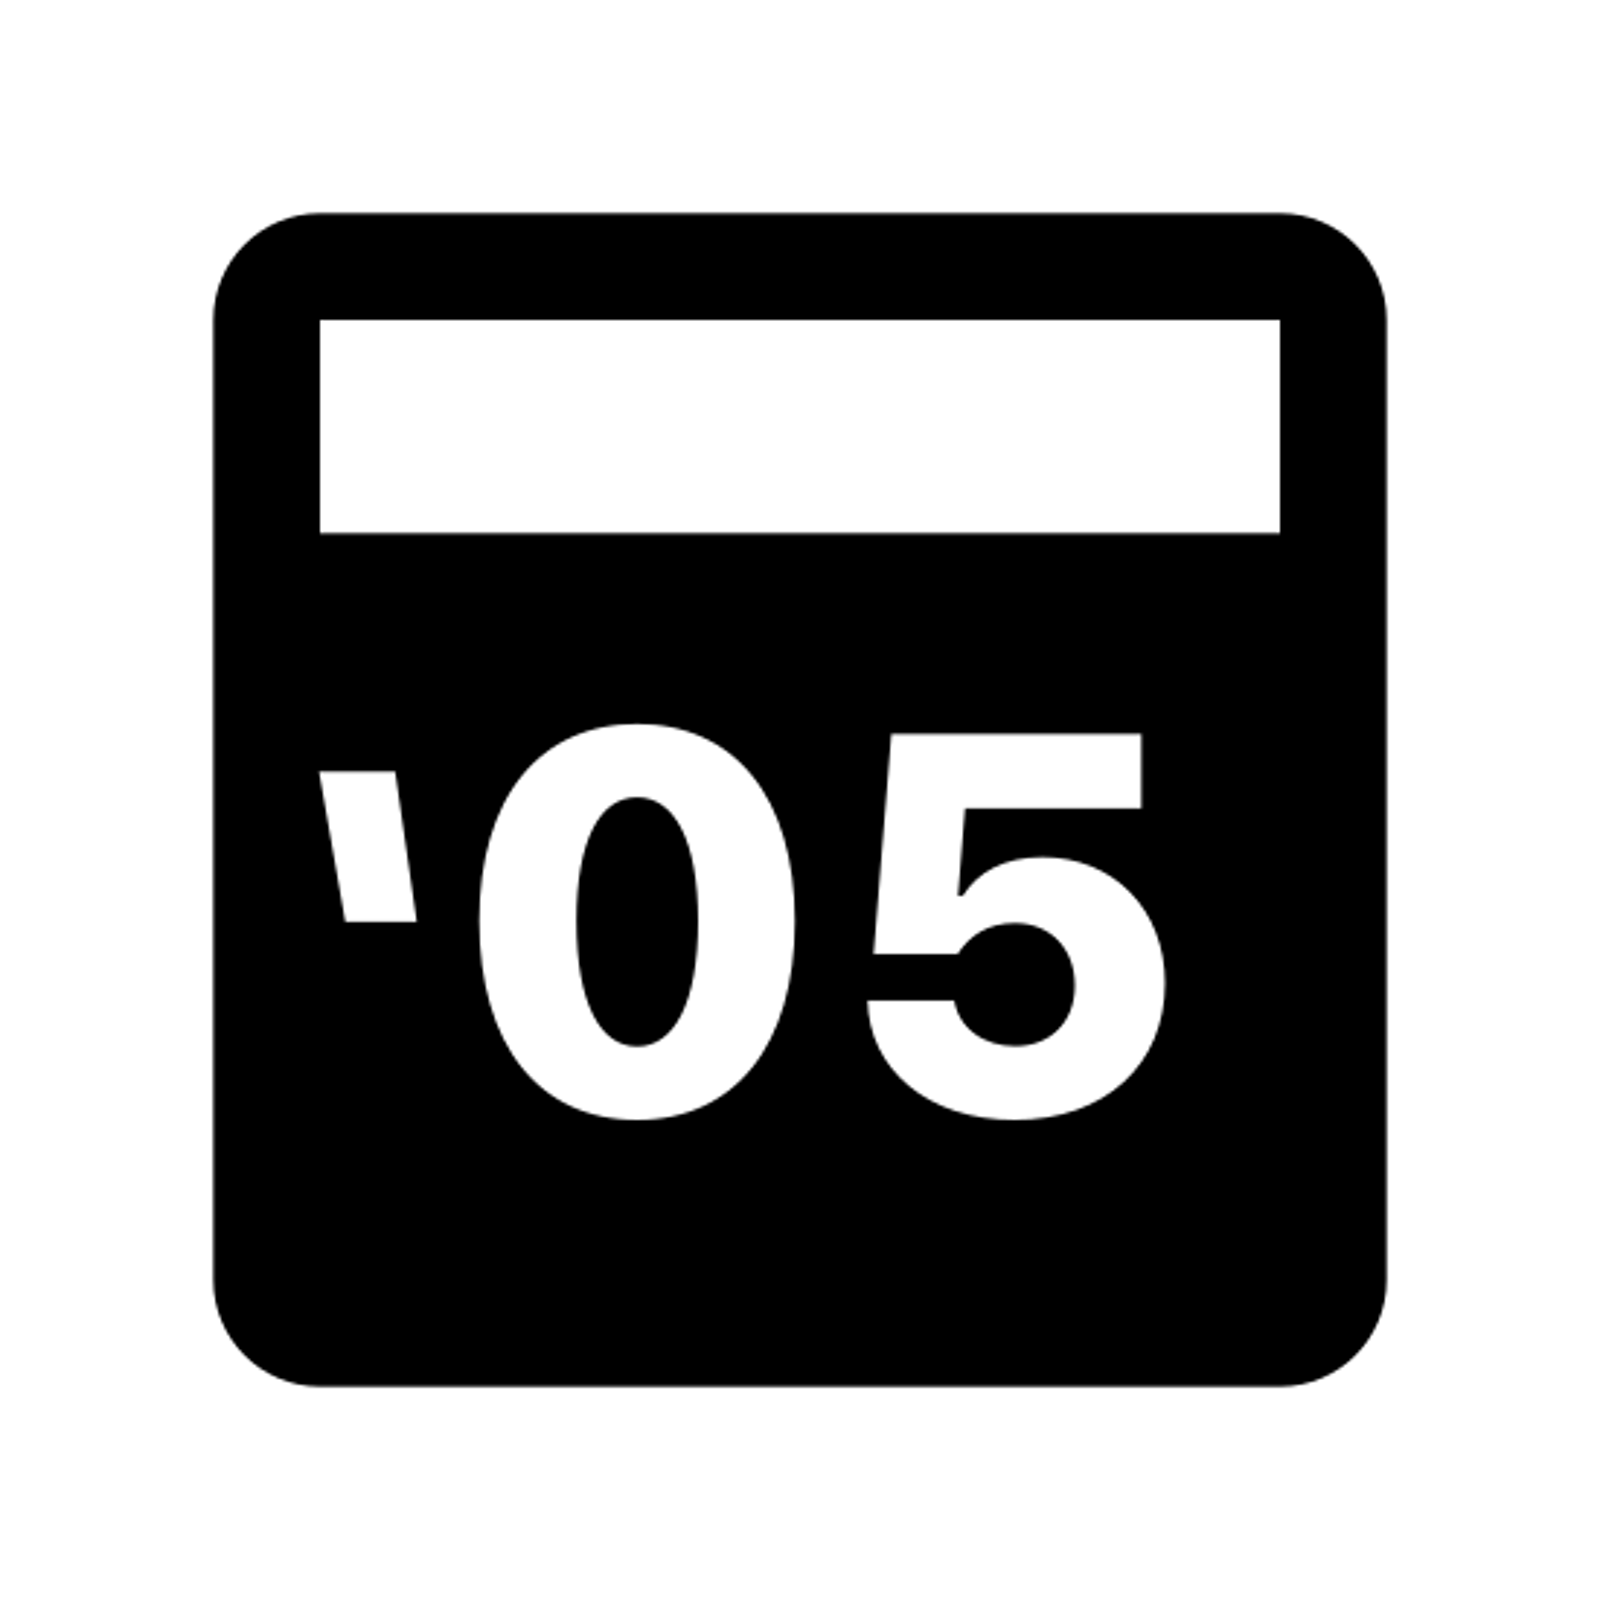 2005 icon